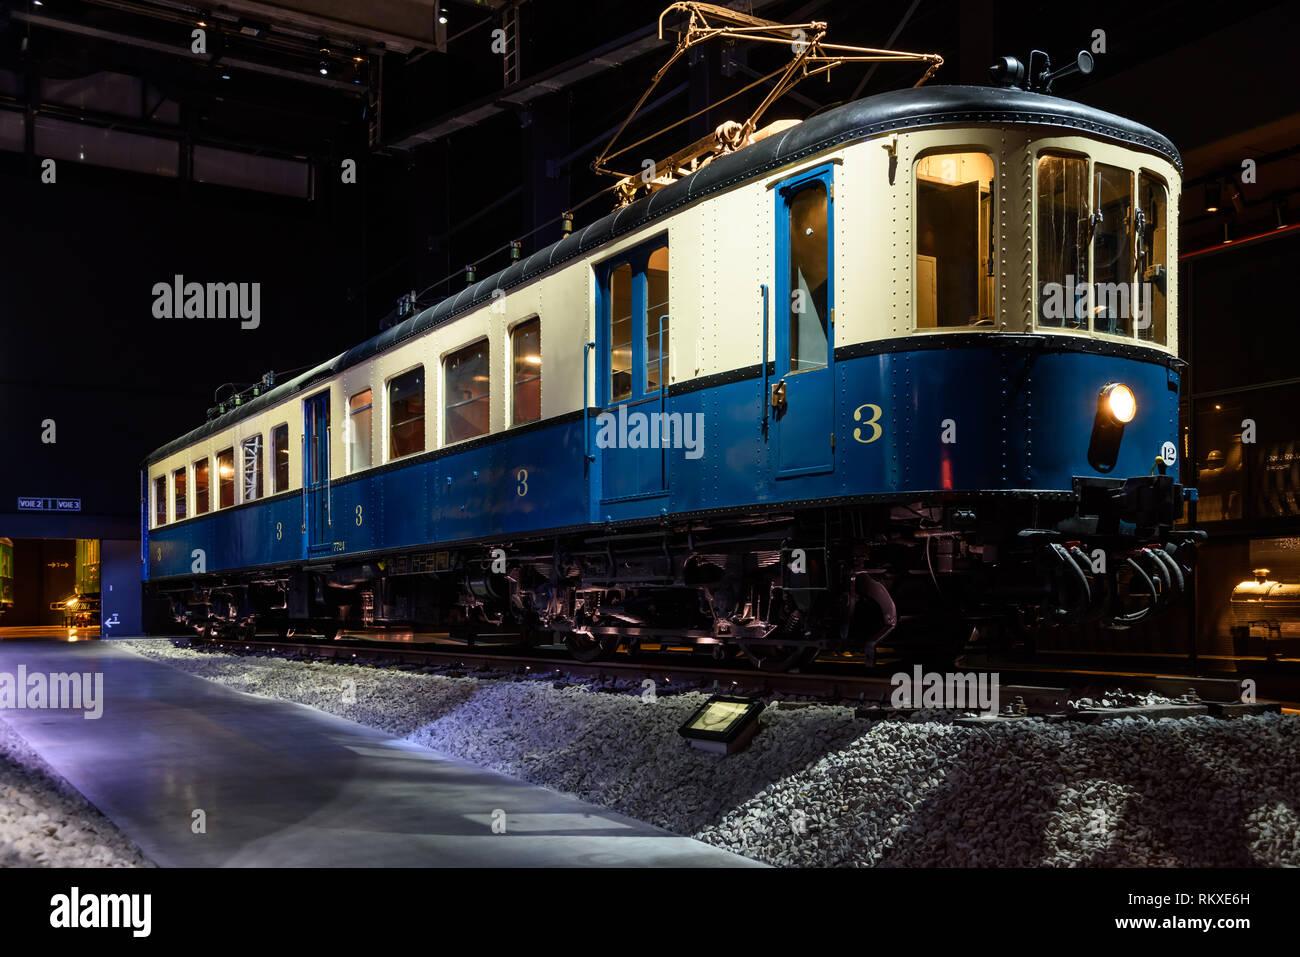 Brüssel, Eisenbahnmuseum Train World - Brussels, Train World Railway Museum Stock Photo